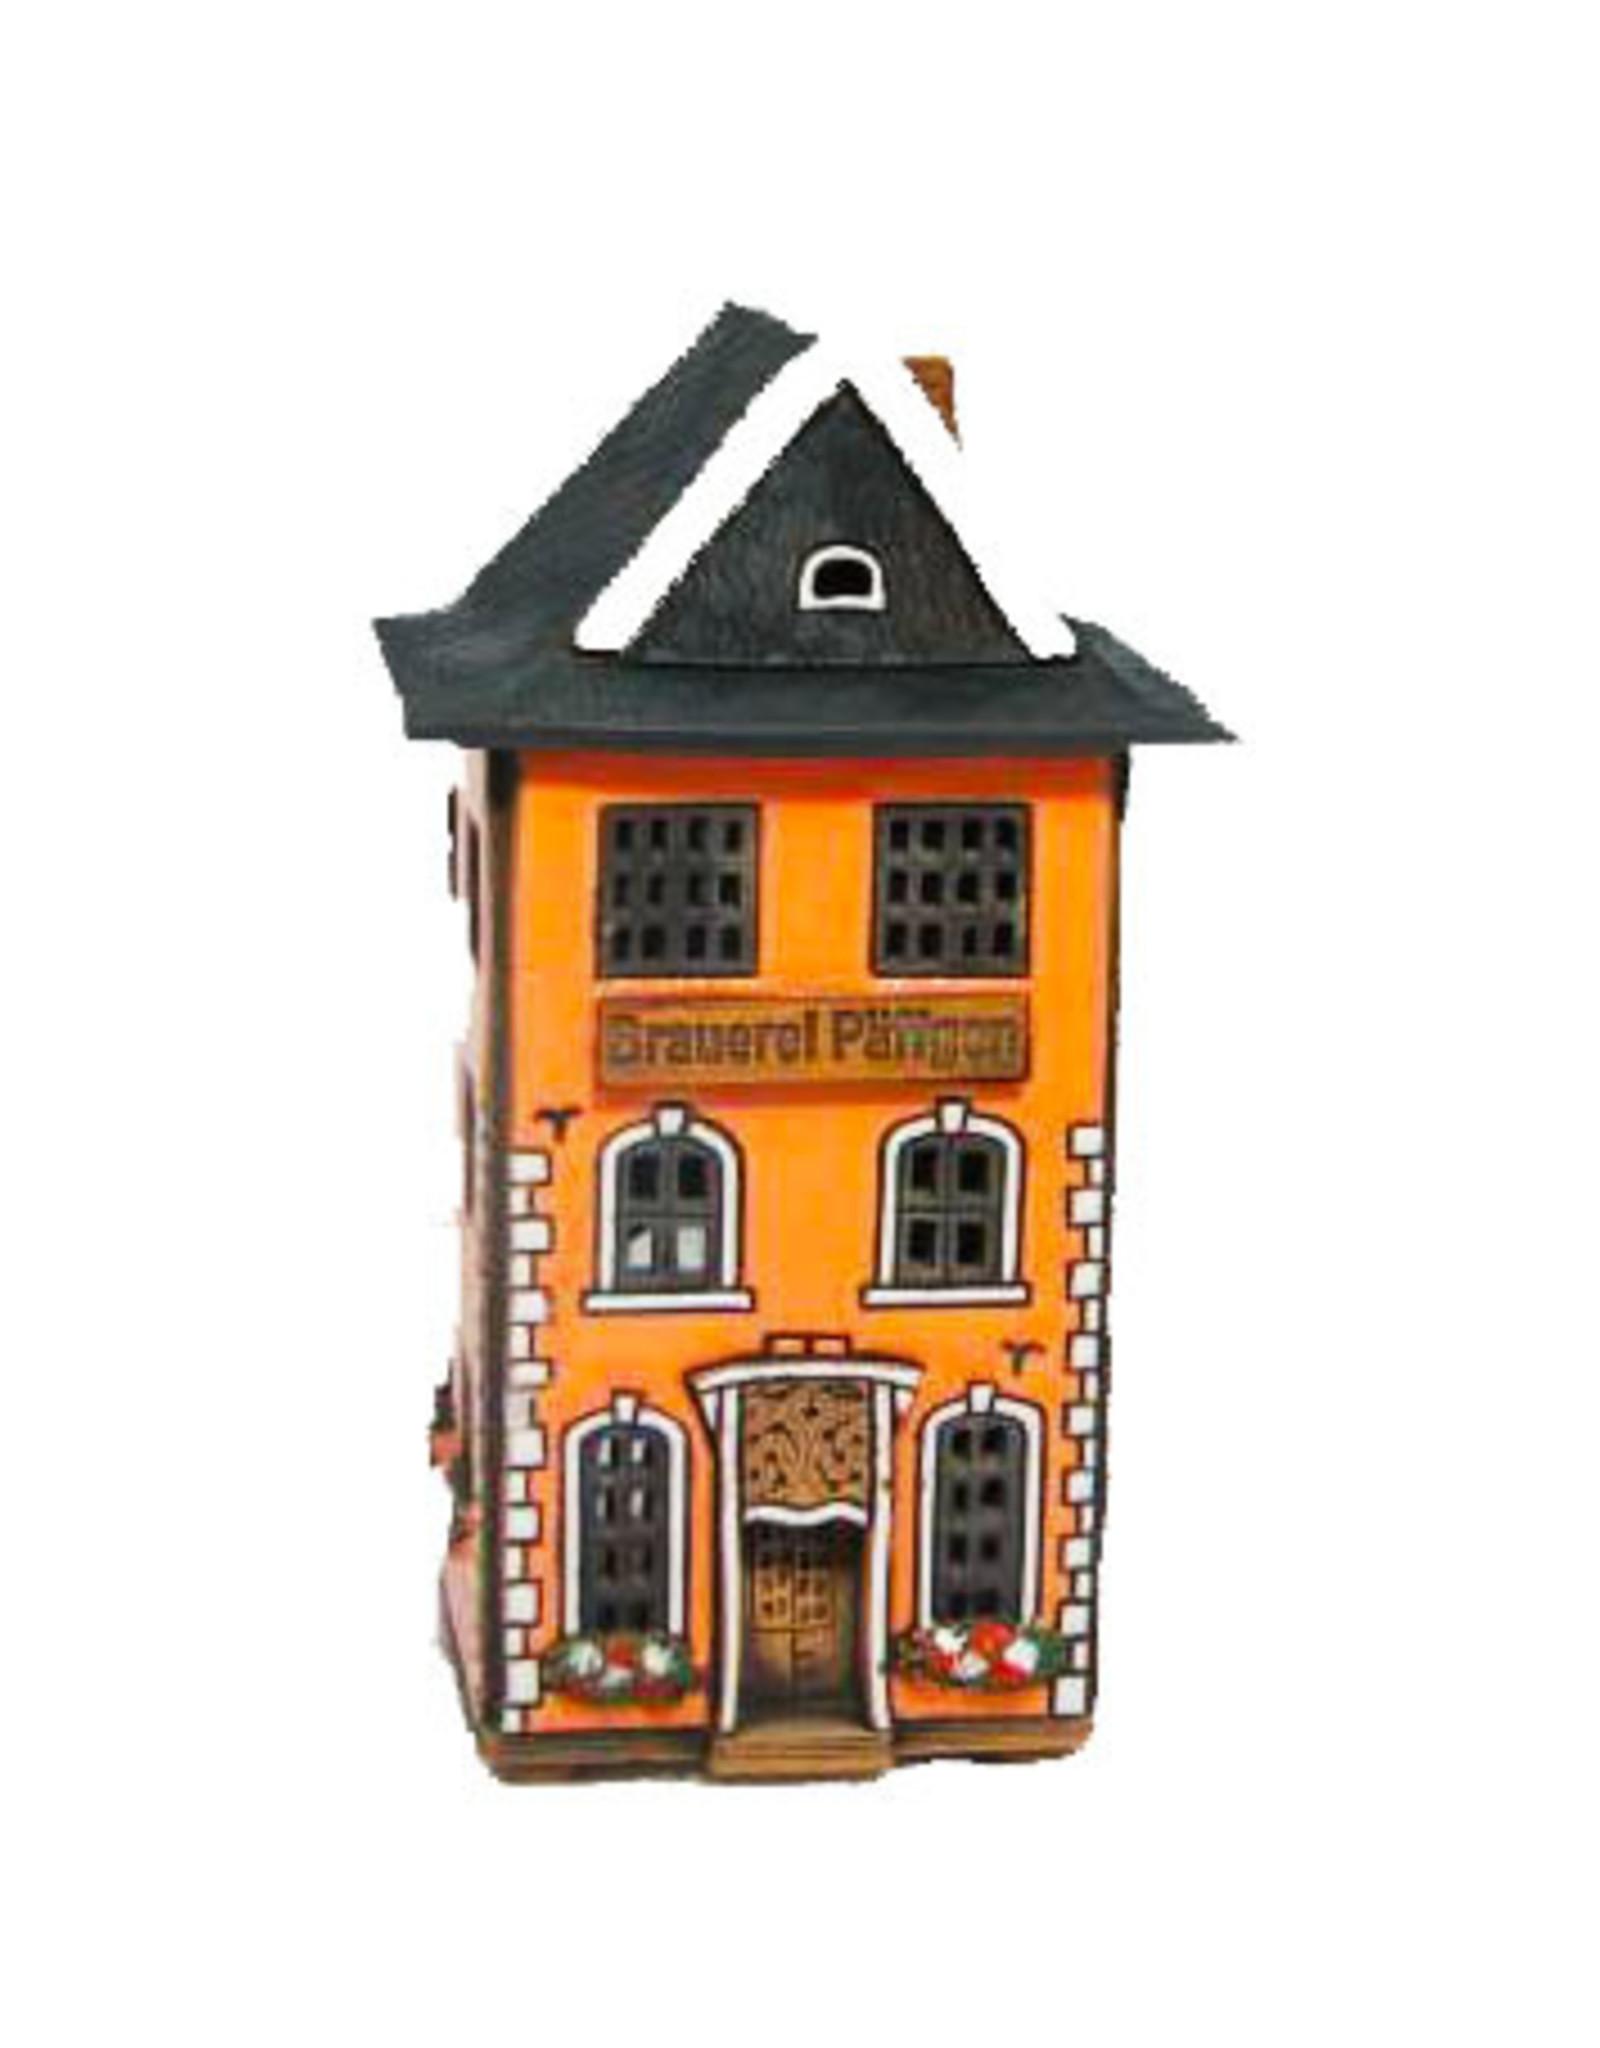 Brauerei zum Pfaffen--Köln candle house